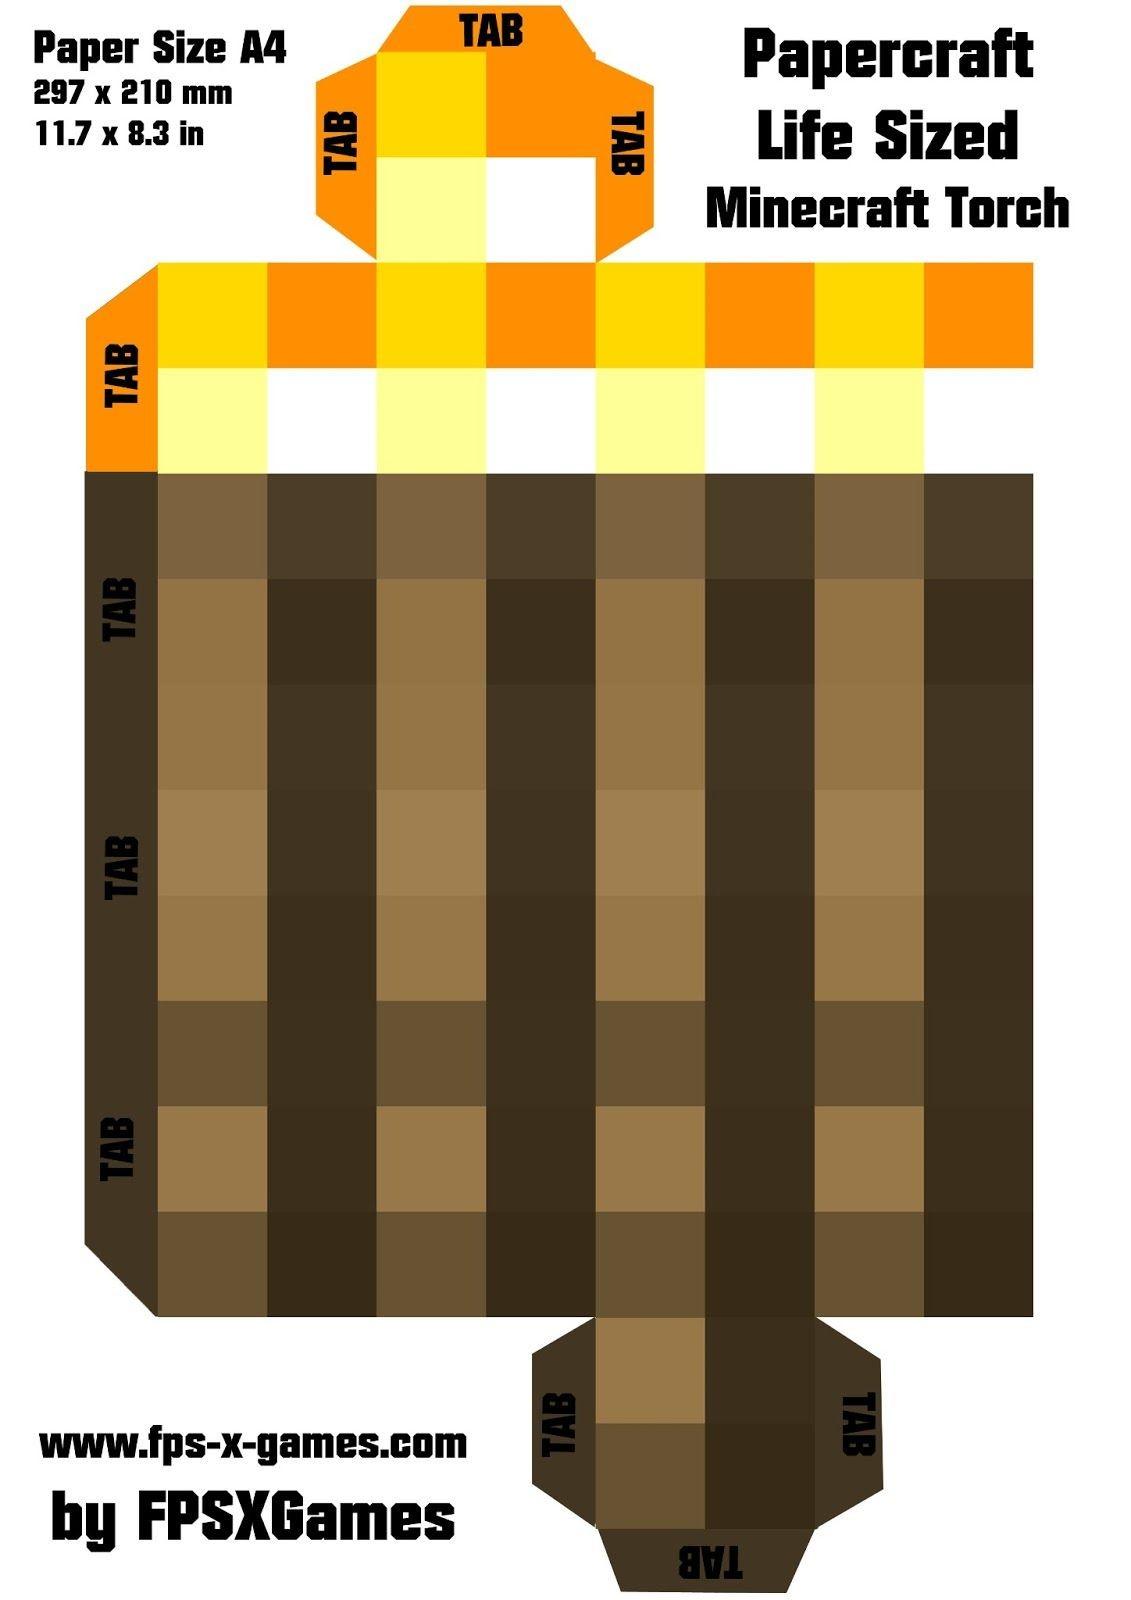 Minecraft Mini Papercraft Artesanato De Minecraft Passo A Passo – tocha Molde